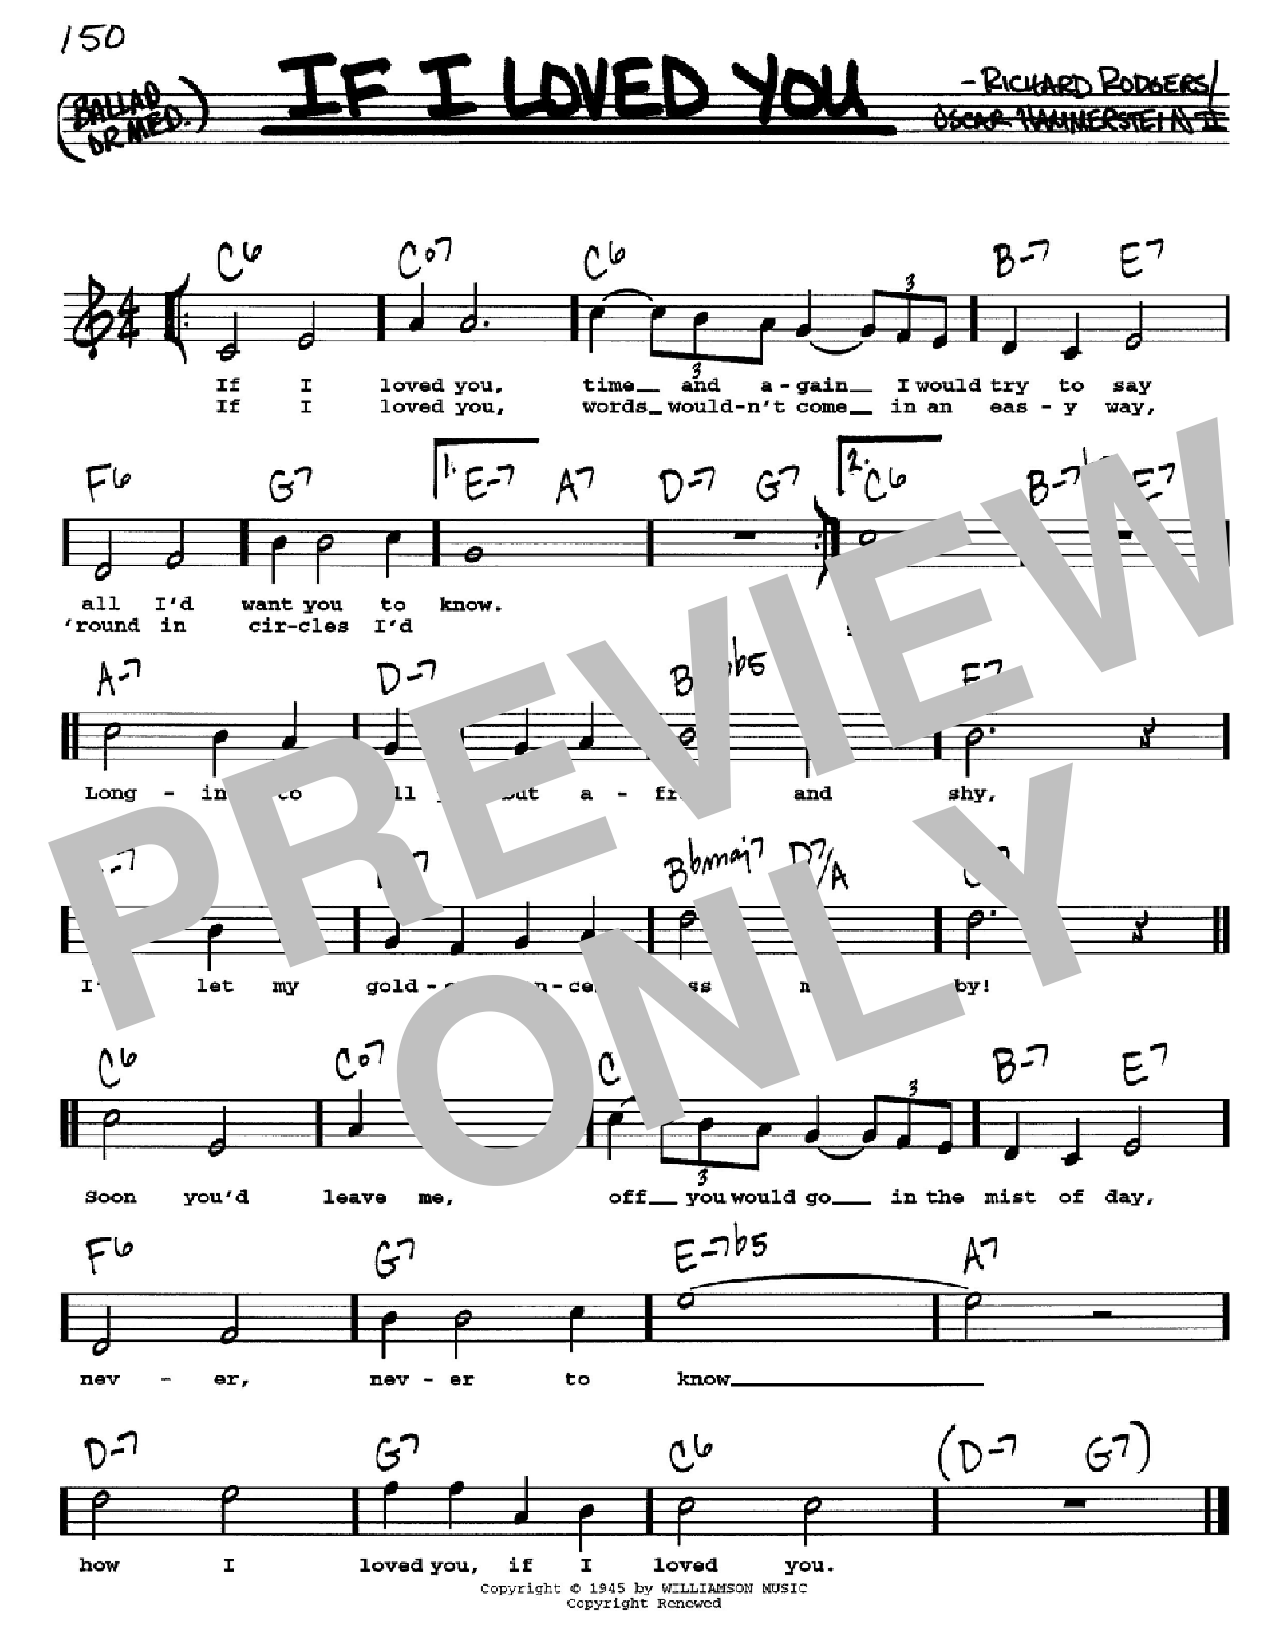 Partition autre If I Loved You de Rodgers & Hammerstein - Real Book, Melodie, Paroles et Accords, Inst. En Do